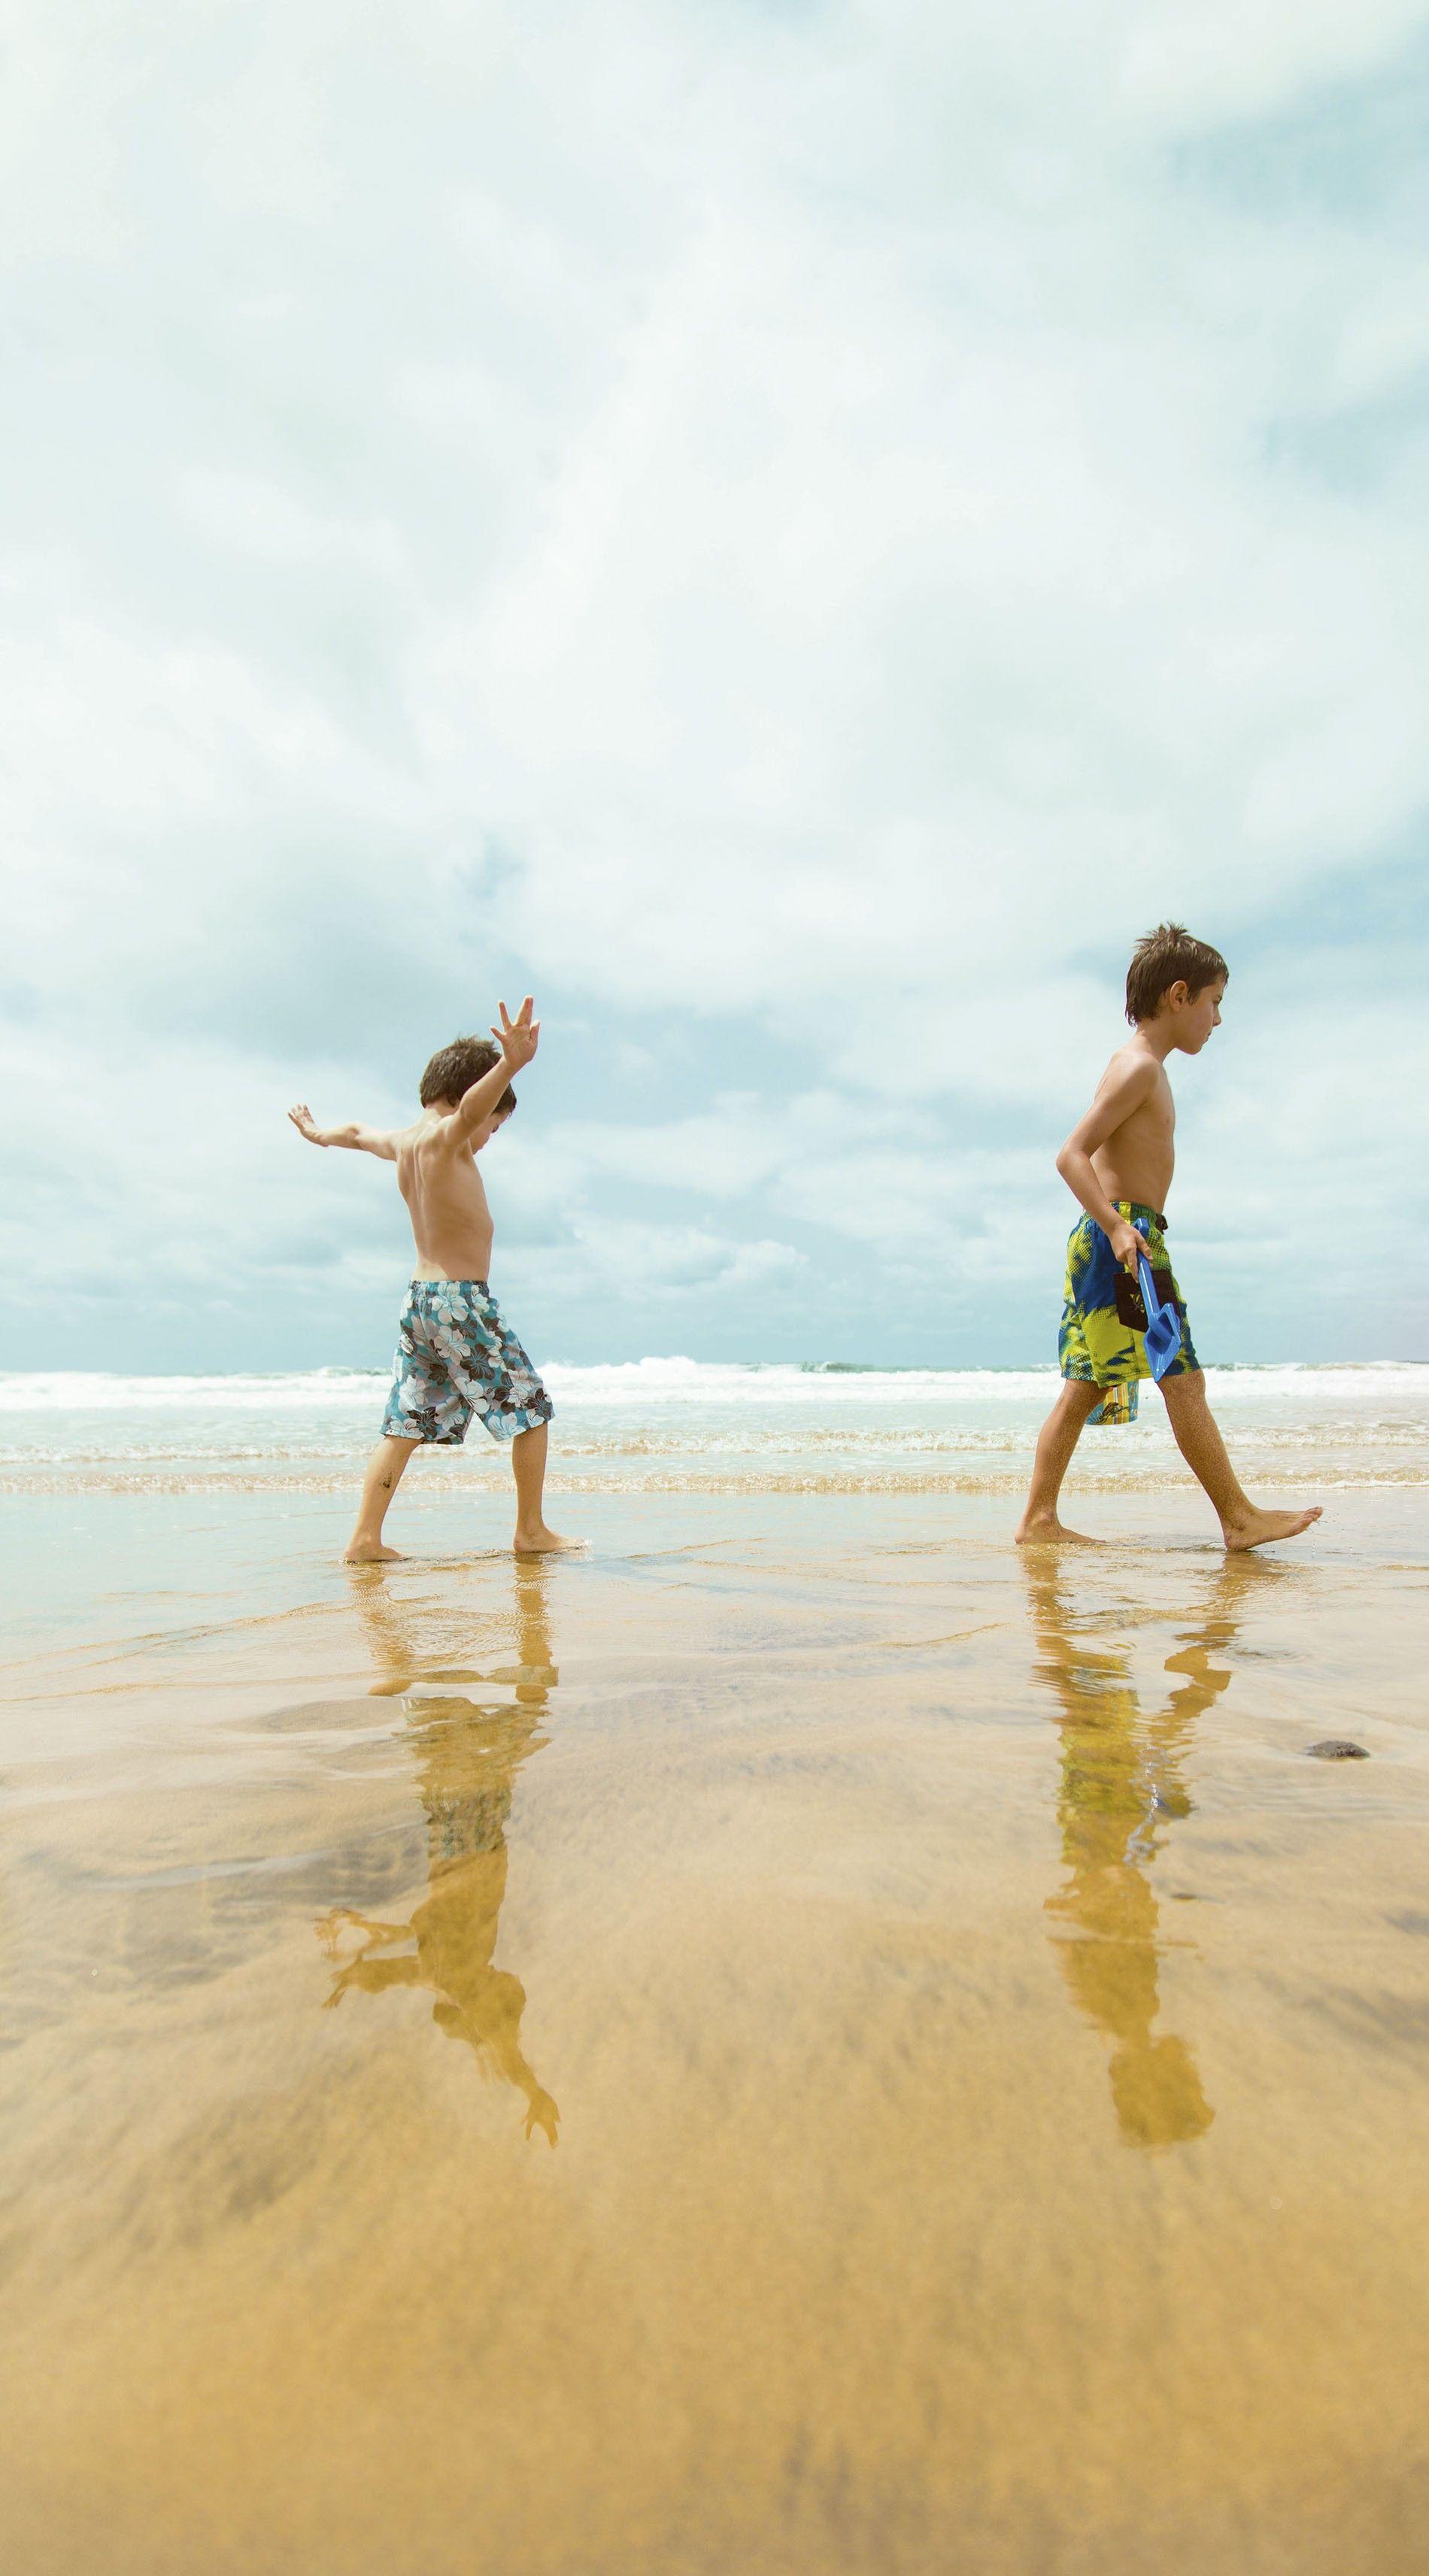 Exploring the beaches in Gran Canaria